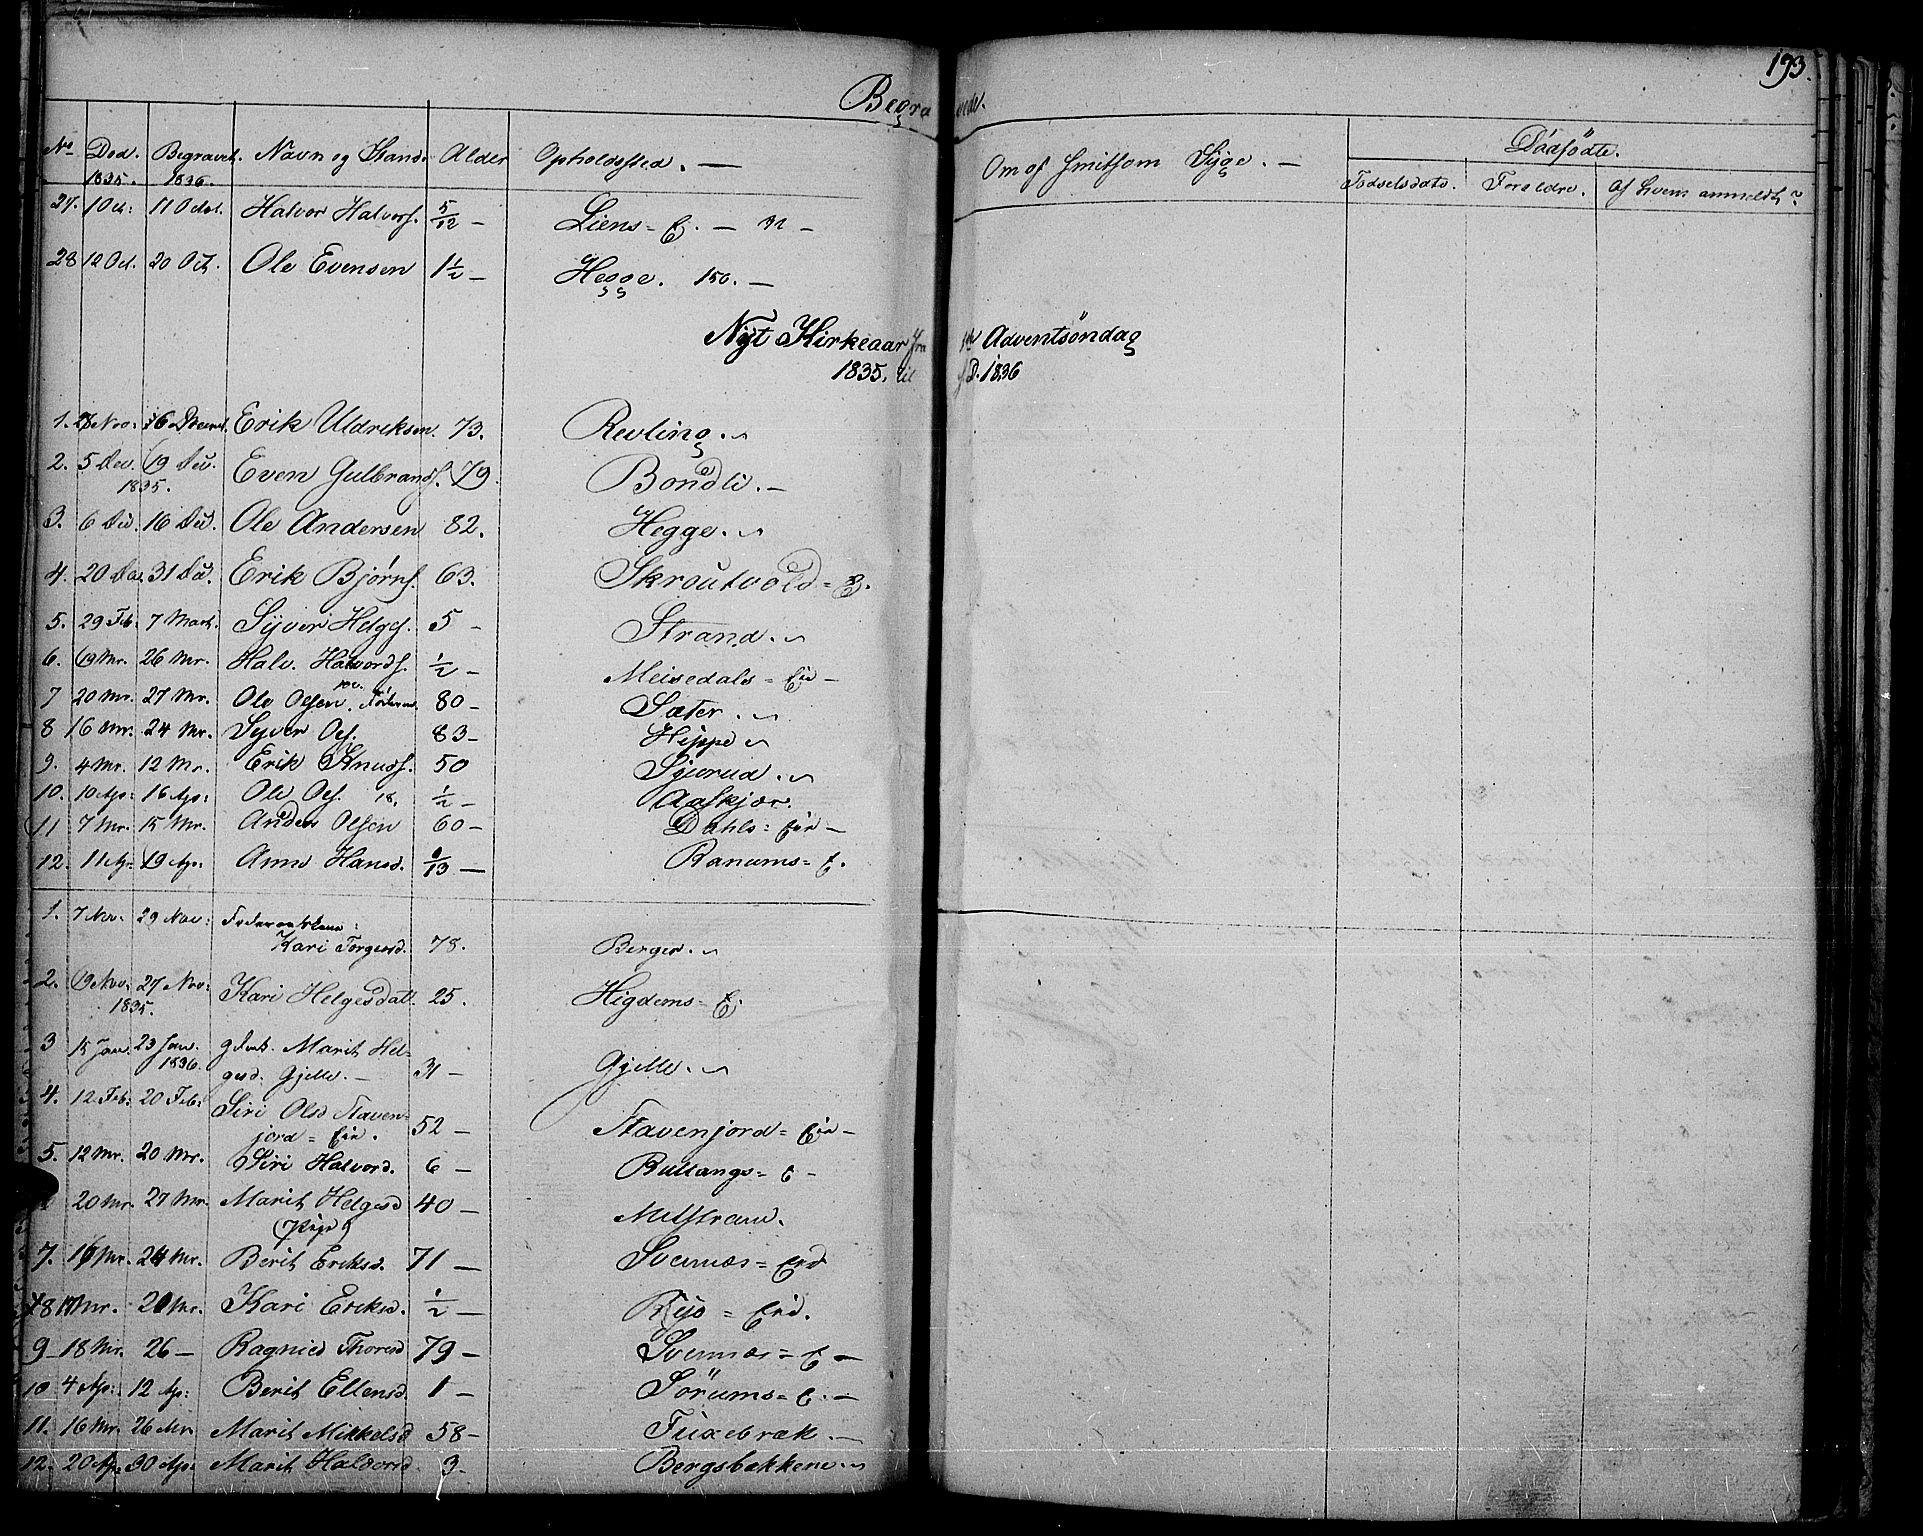 SAH, Nord-Aurdal prestekontor, Ministerialbok nr. 3, 1828-1841, s. 193